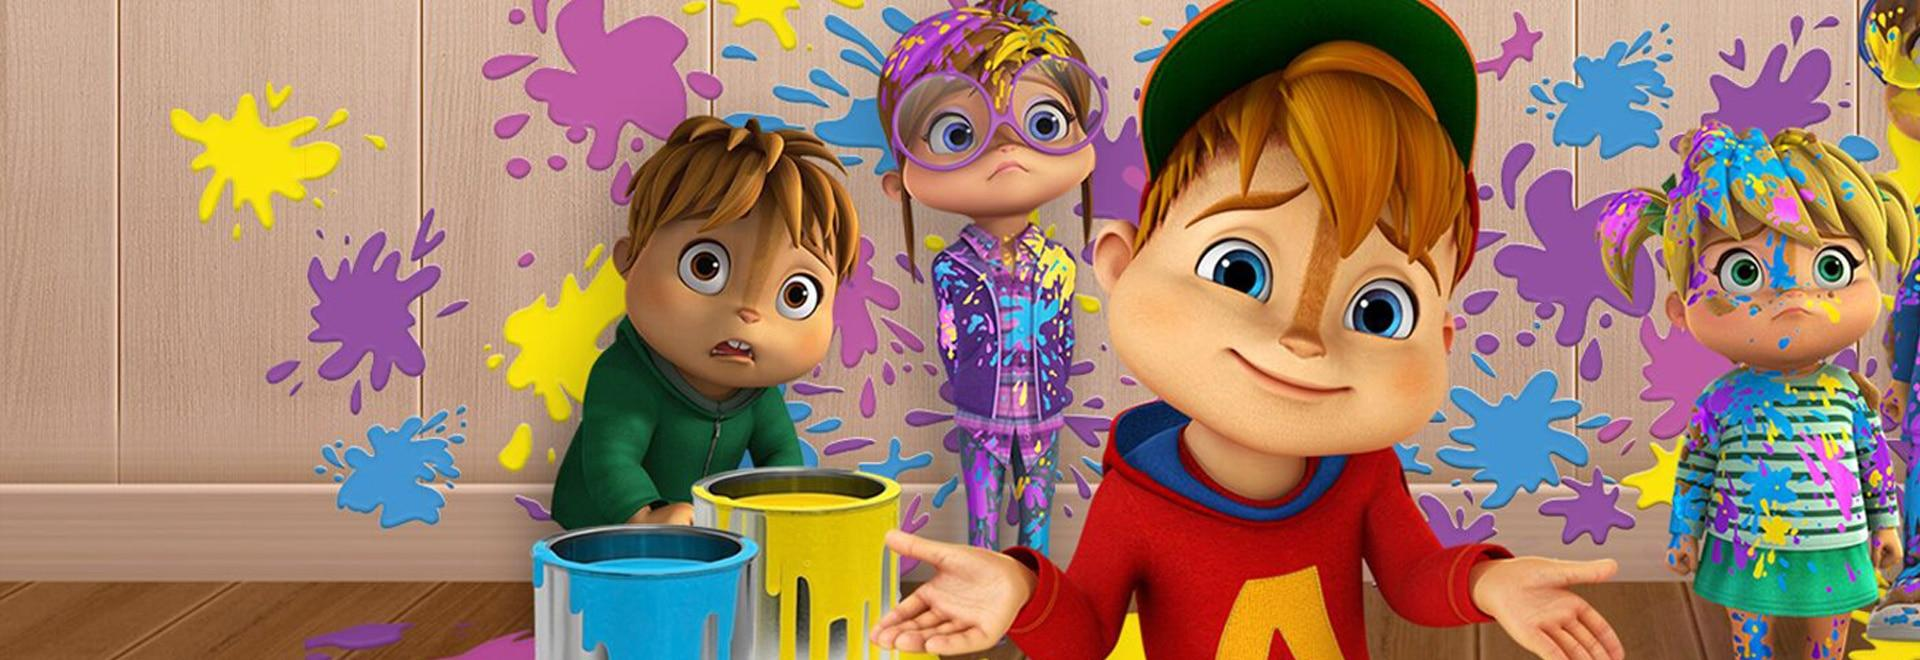 Alvinnn!!! and the Chipmunks